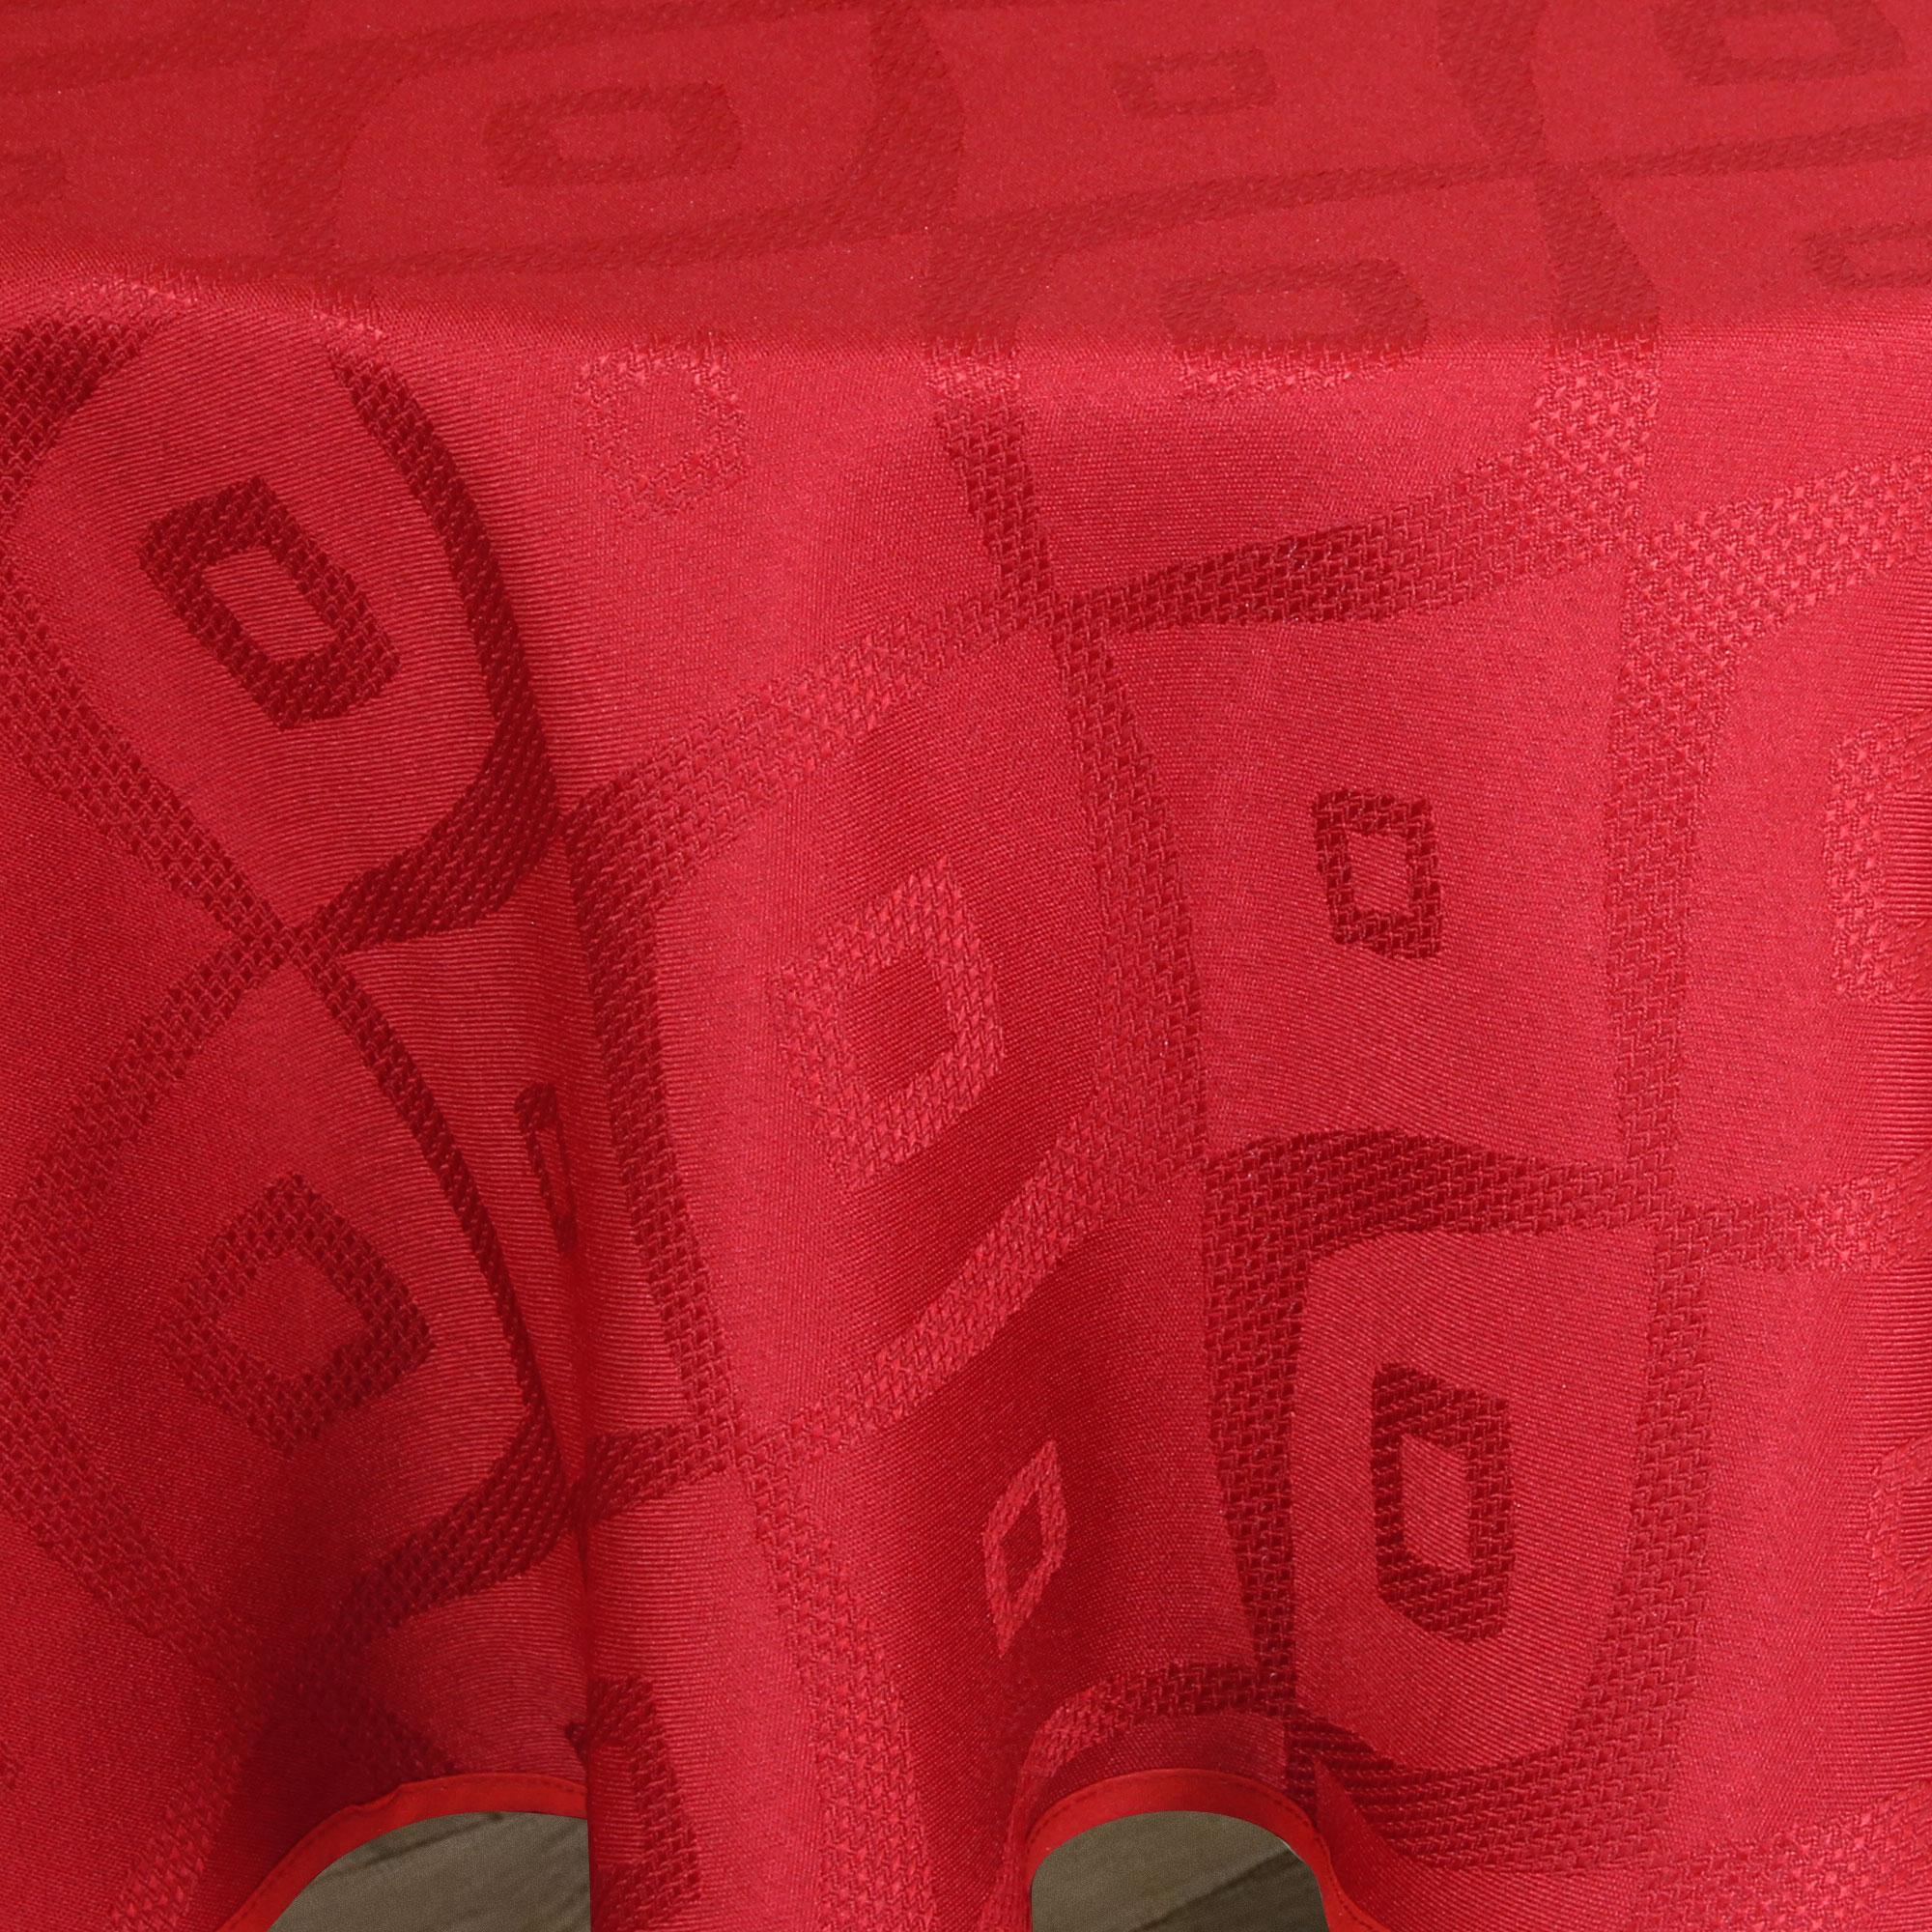 nappe ovale 180x240 cm jacquard 100 polyester brunch rouge linnea linge de maison et. Black Bedroom Furniture Sets. Home Design Ideas